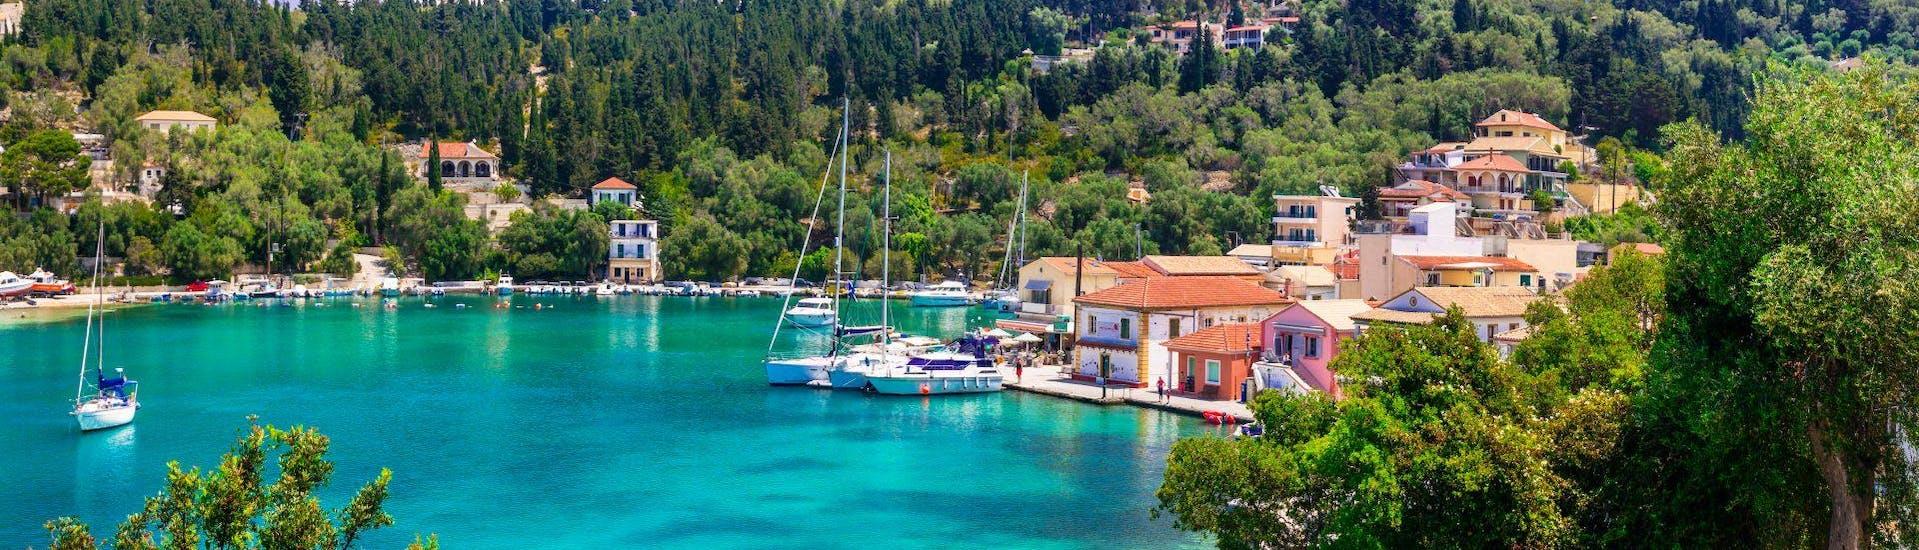 Boat Trip to Lakka-Paxos, Antipaxos & Caves from Lefkimmi with Corfu Cruises - Hero image